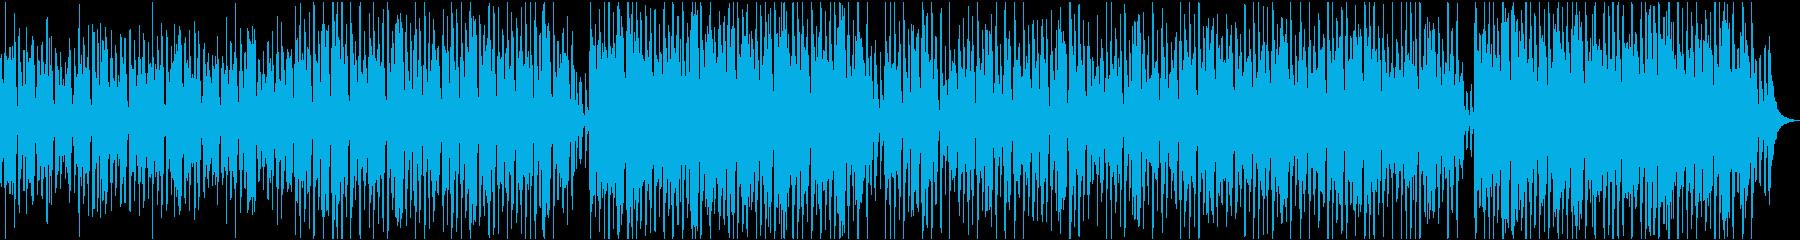 Inspiring Recorderの再生済みの波形